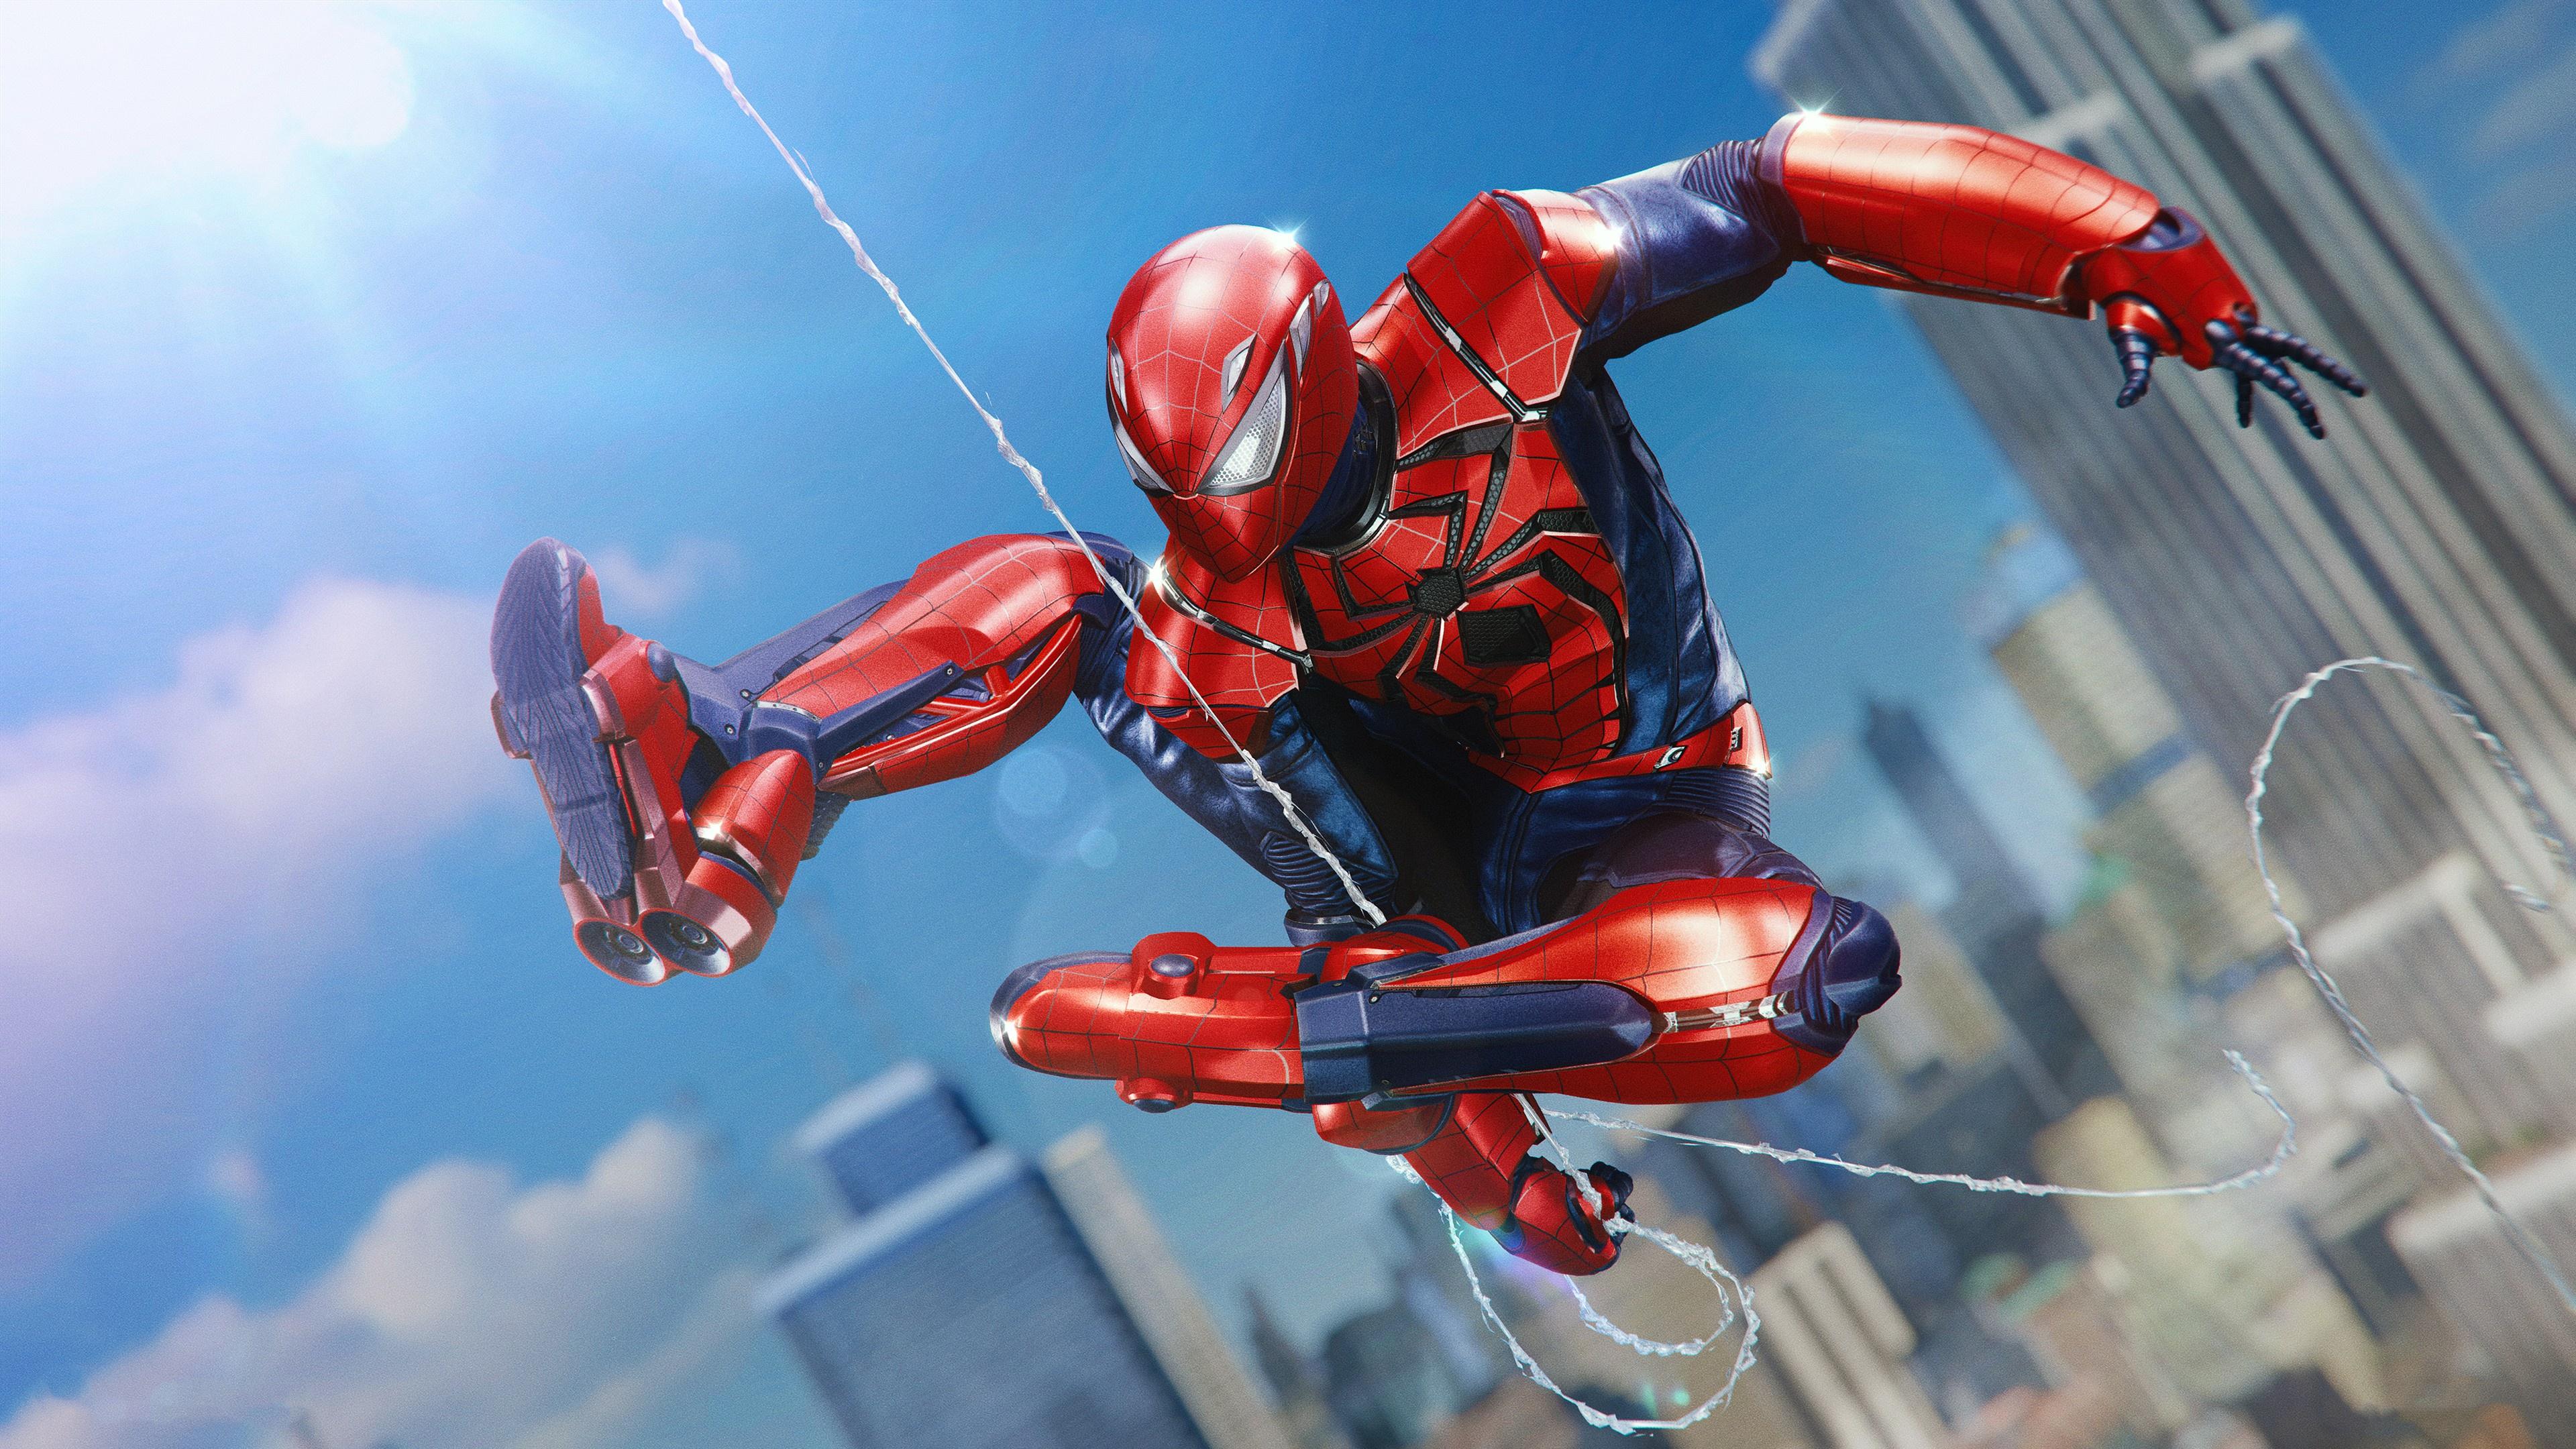 General 3840x2160 Peter Parker Spider-Man video games video game art Marvel Comics